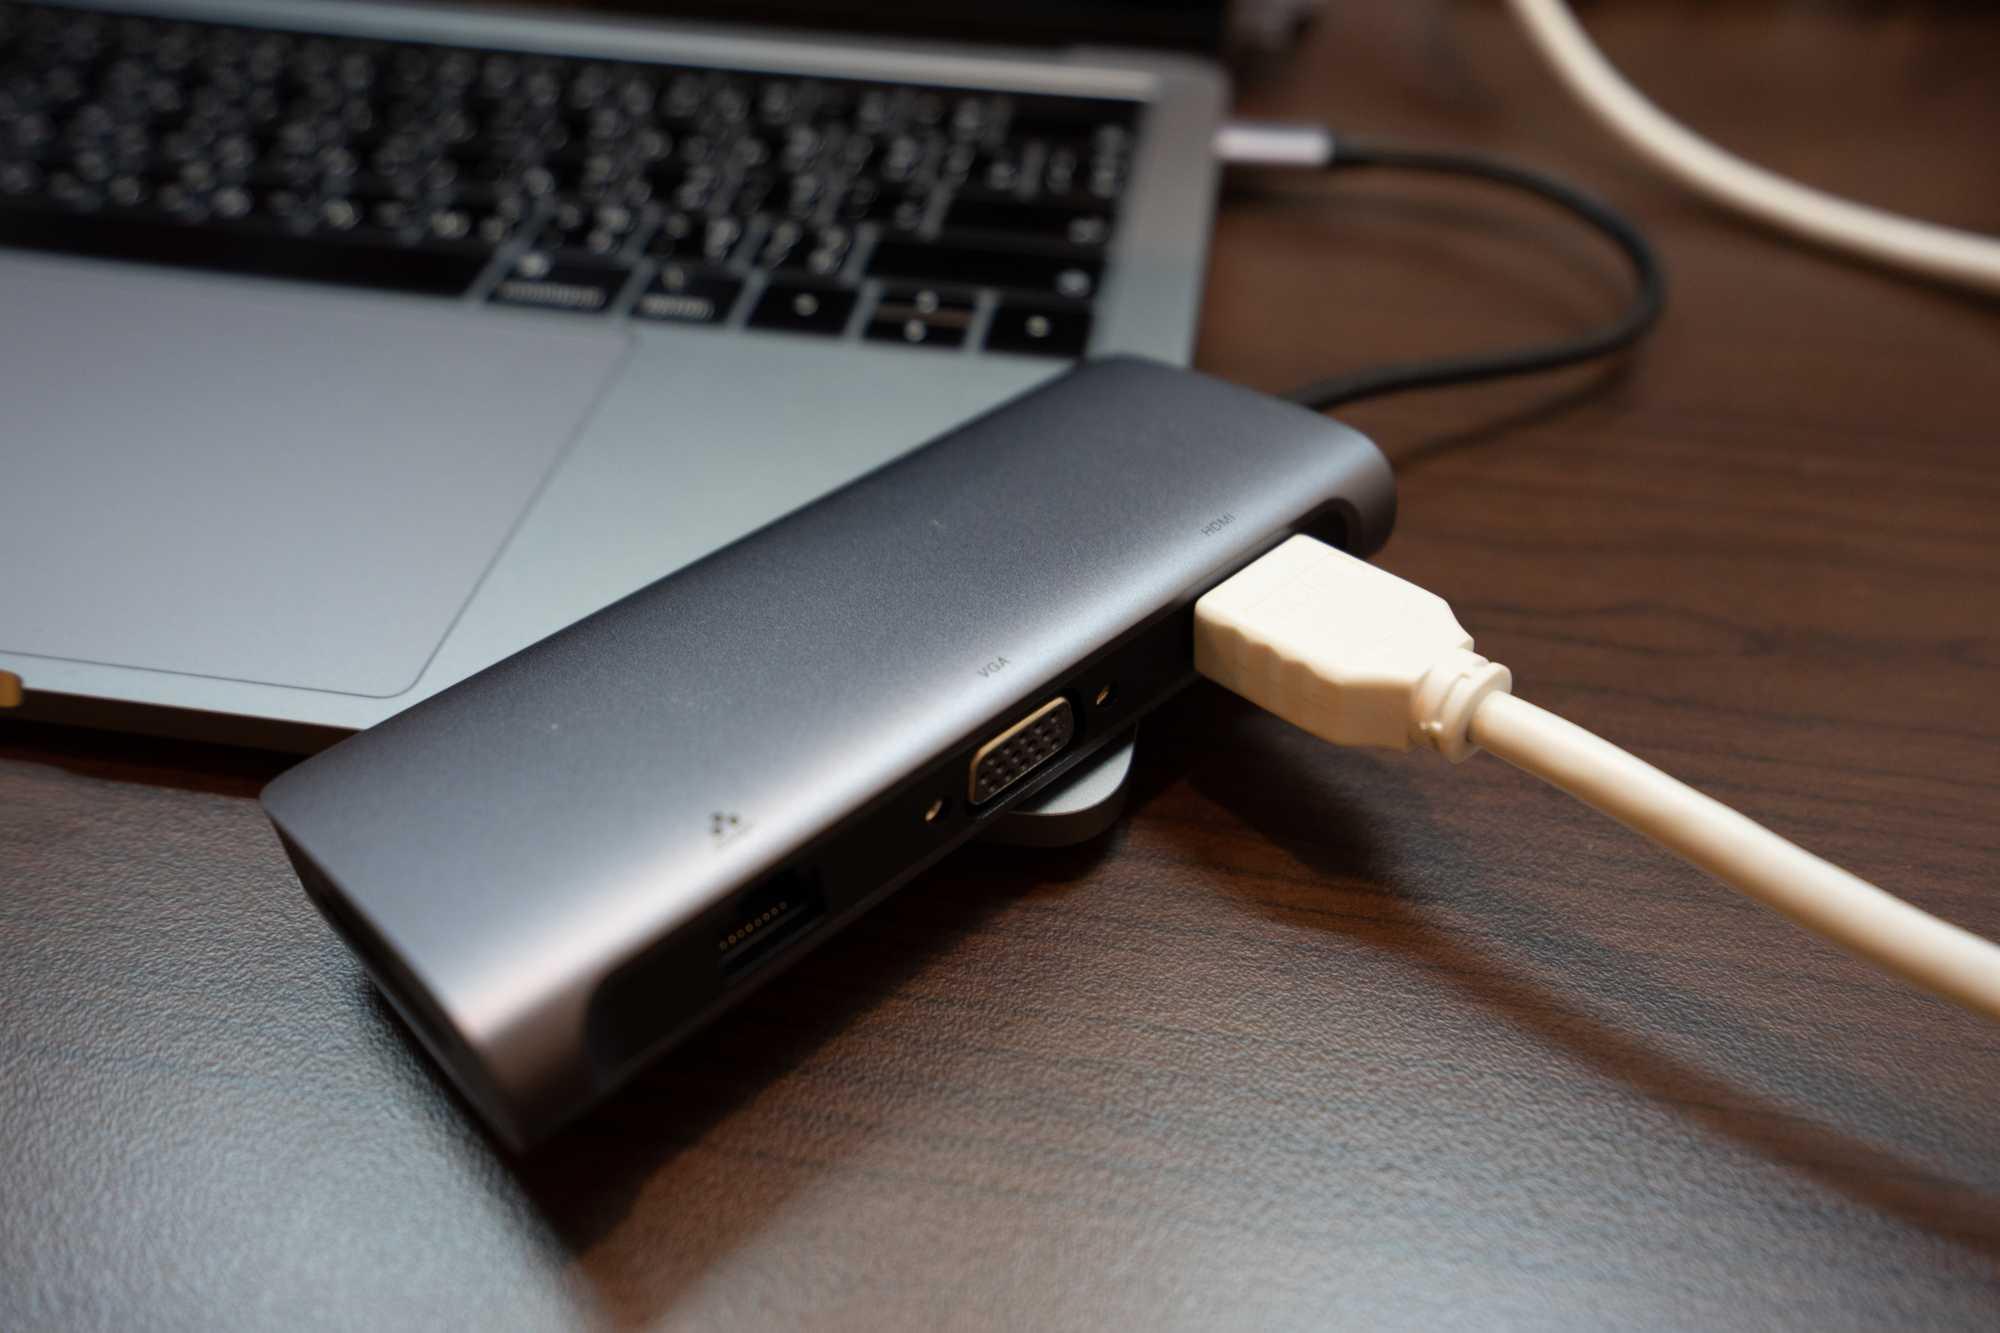 UGREEN USB-C 9-in 1 Multifunctional Adapter